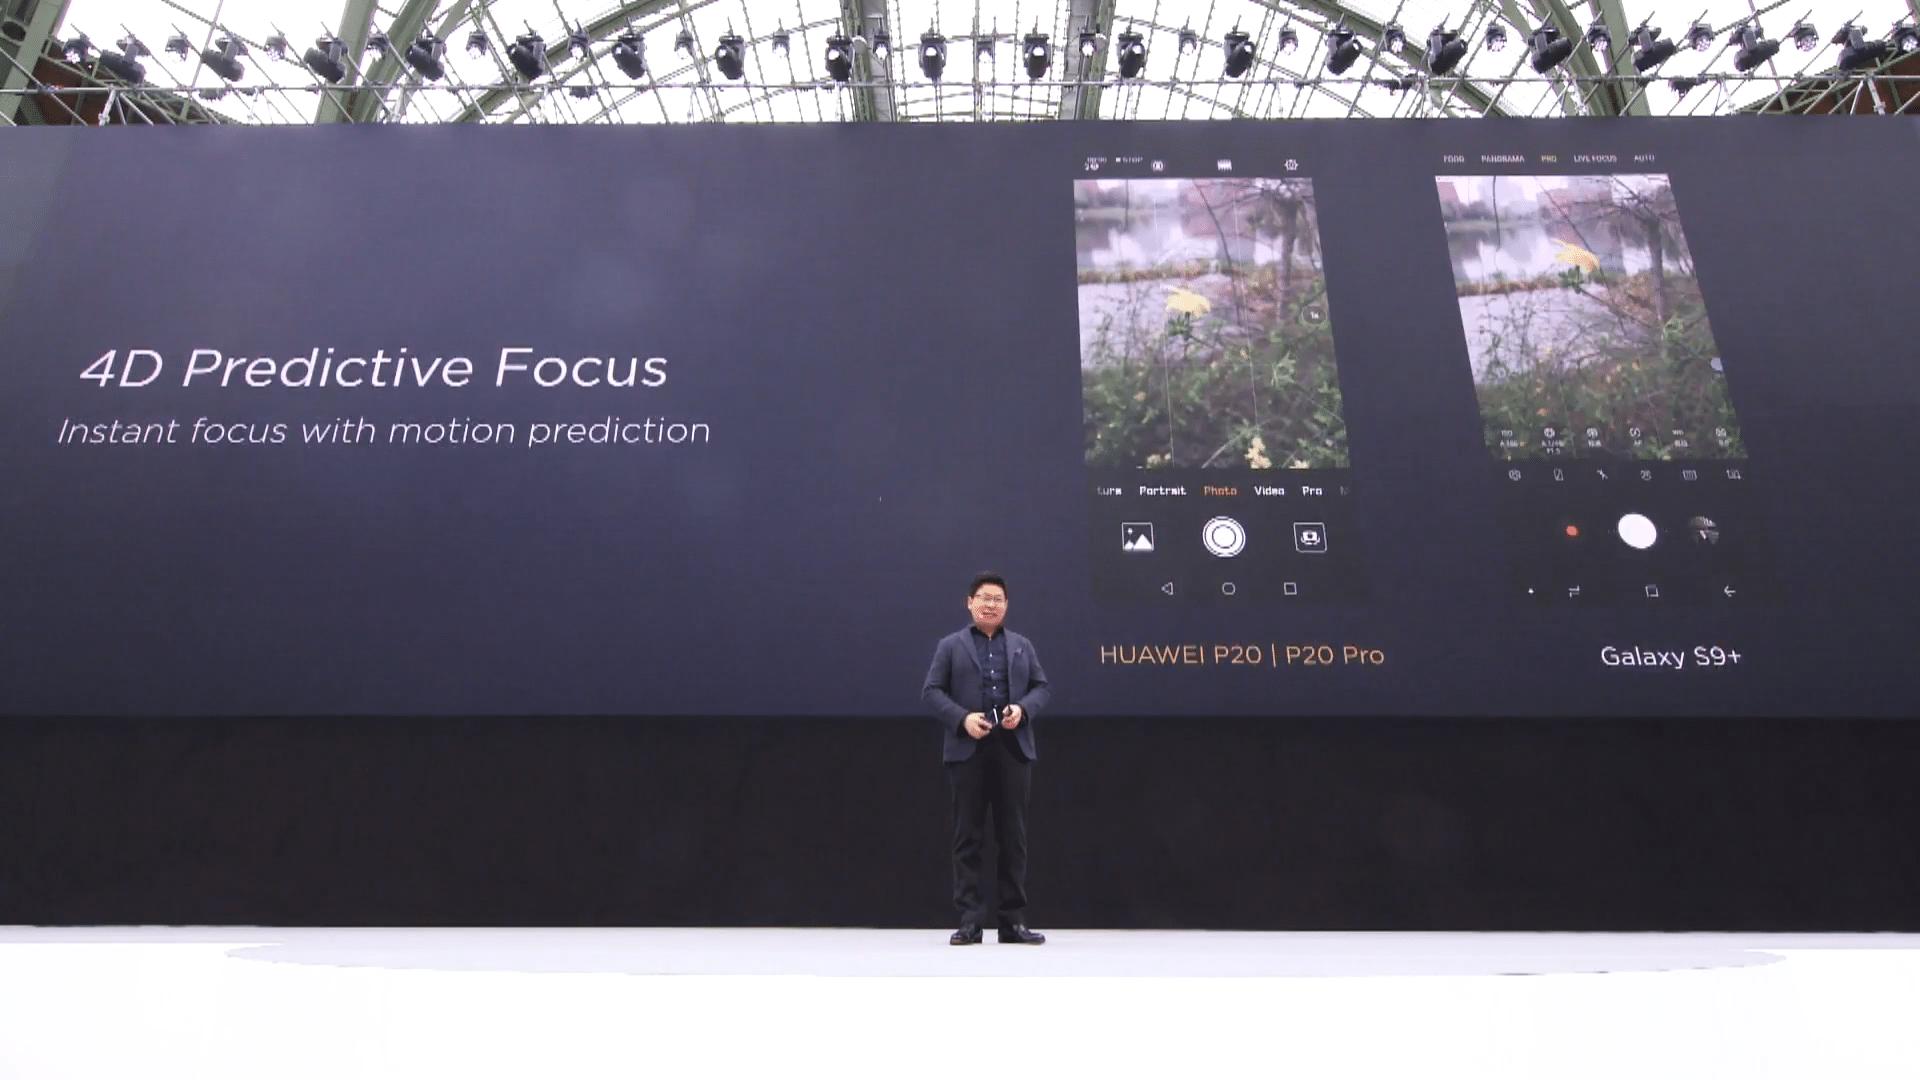 Huawei P20 P20 Pro Predictive Focus